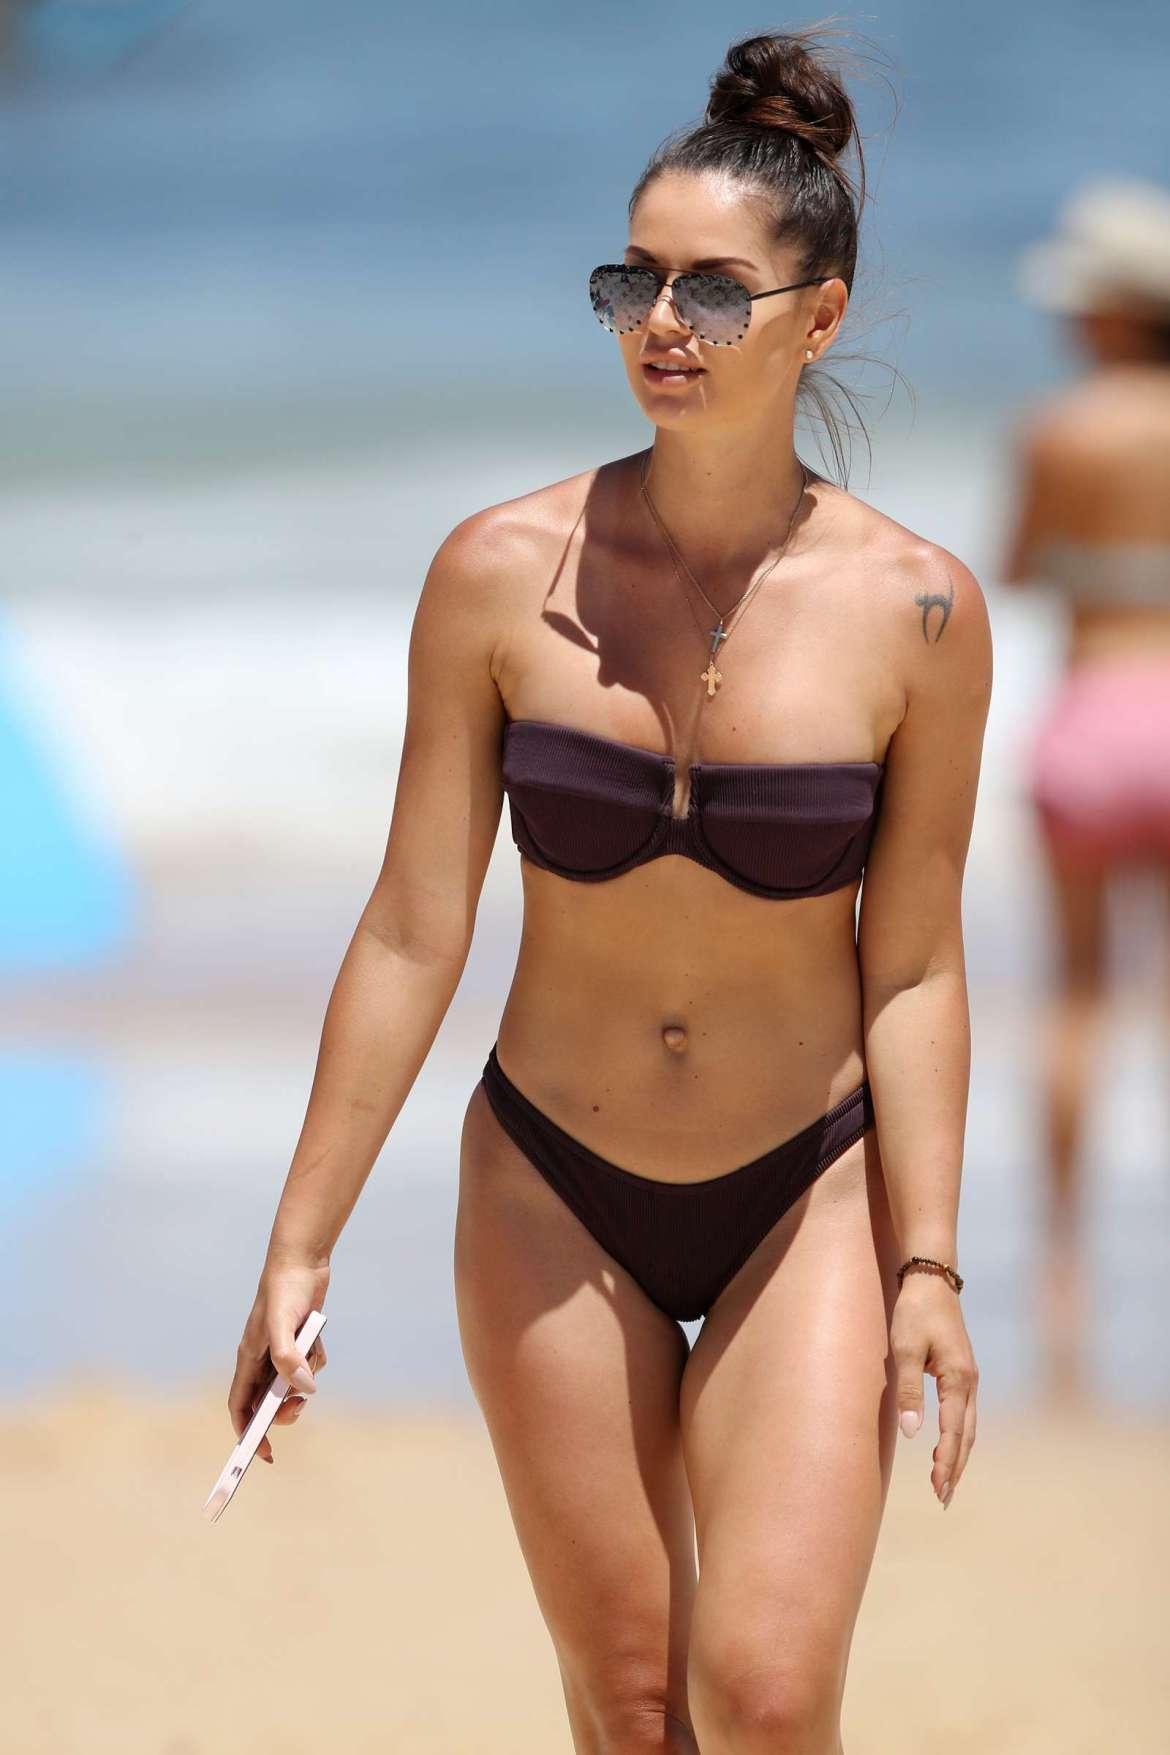 Dasha Gaivoronski in Bikini at the beach in Bondi